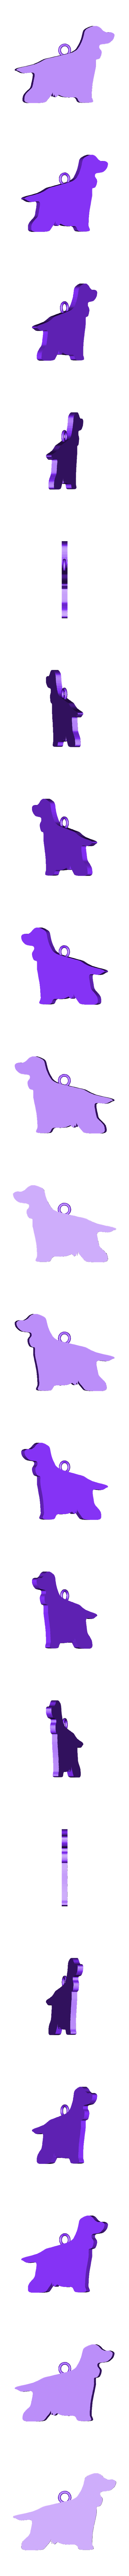 32.stl Download STL file Dogs • 3D printing object, GENNADI3313